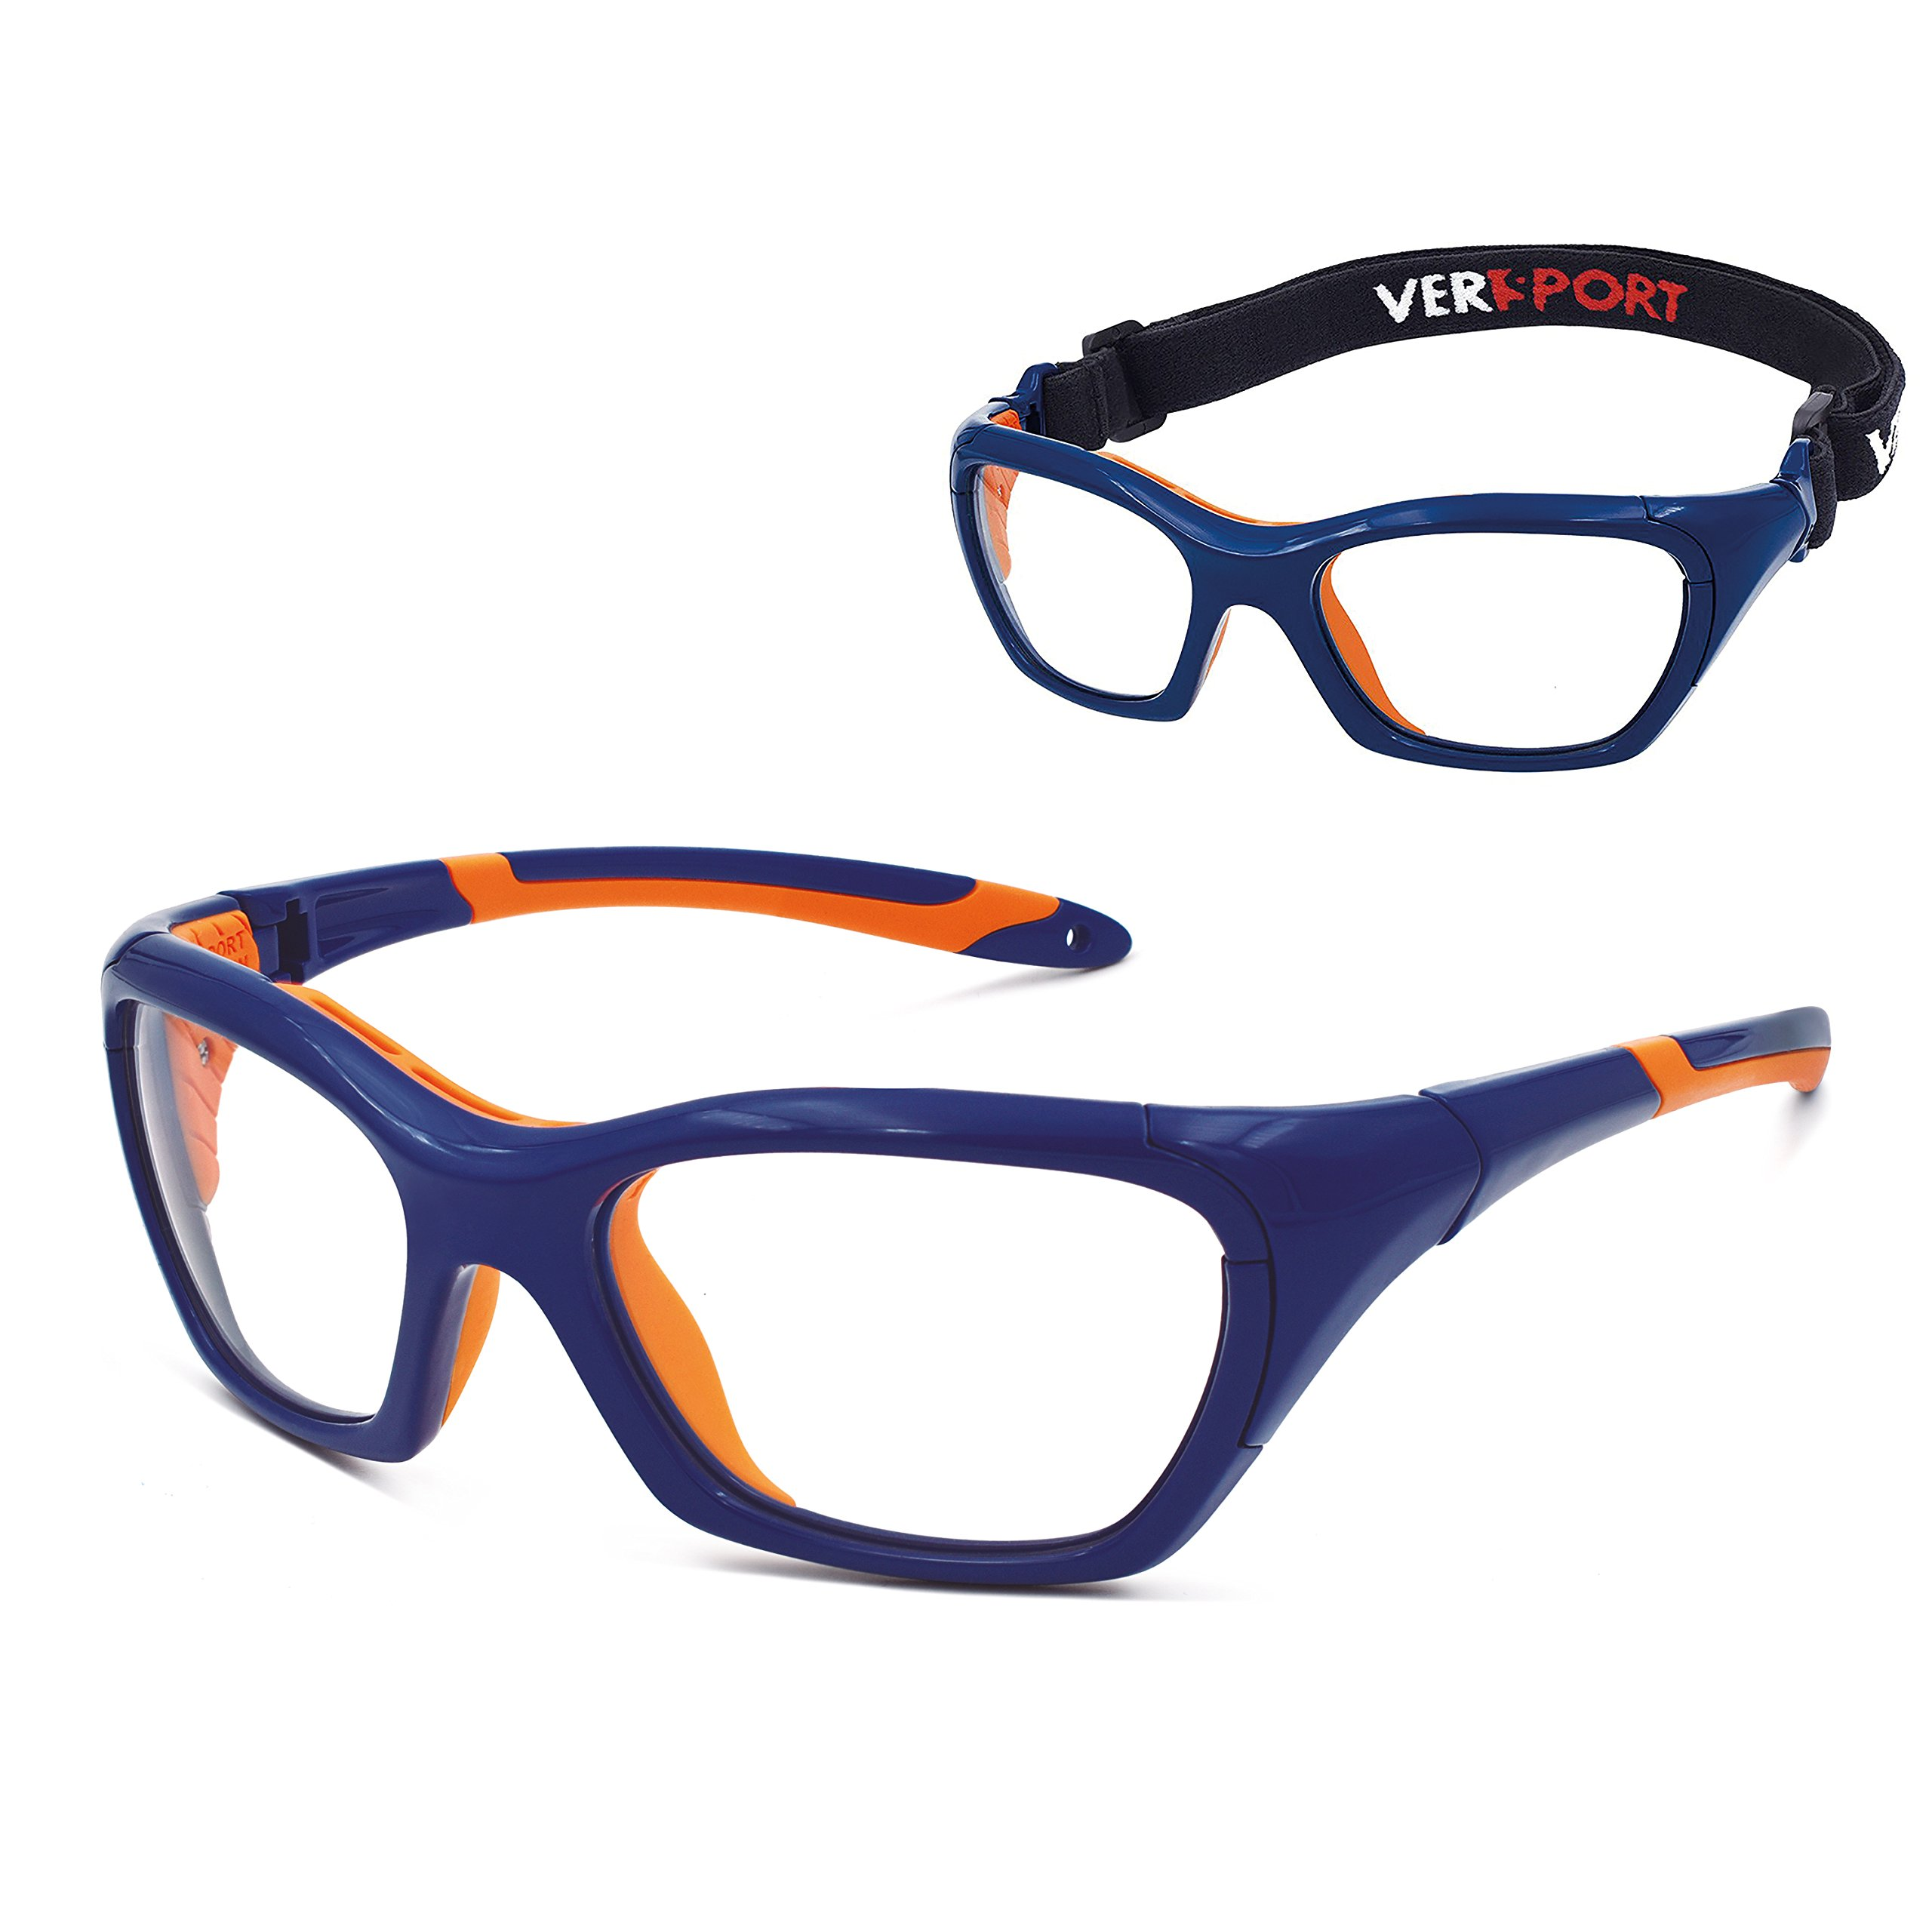 a13338d244 VERSPORT  HERCULES 52 Protective Sports Glasses - Marine Orange ...